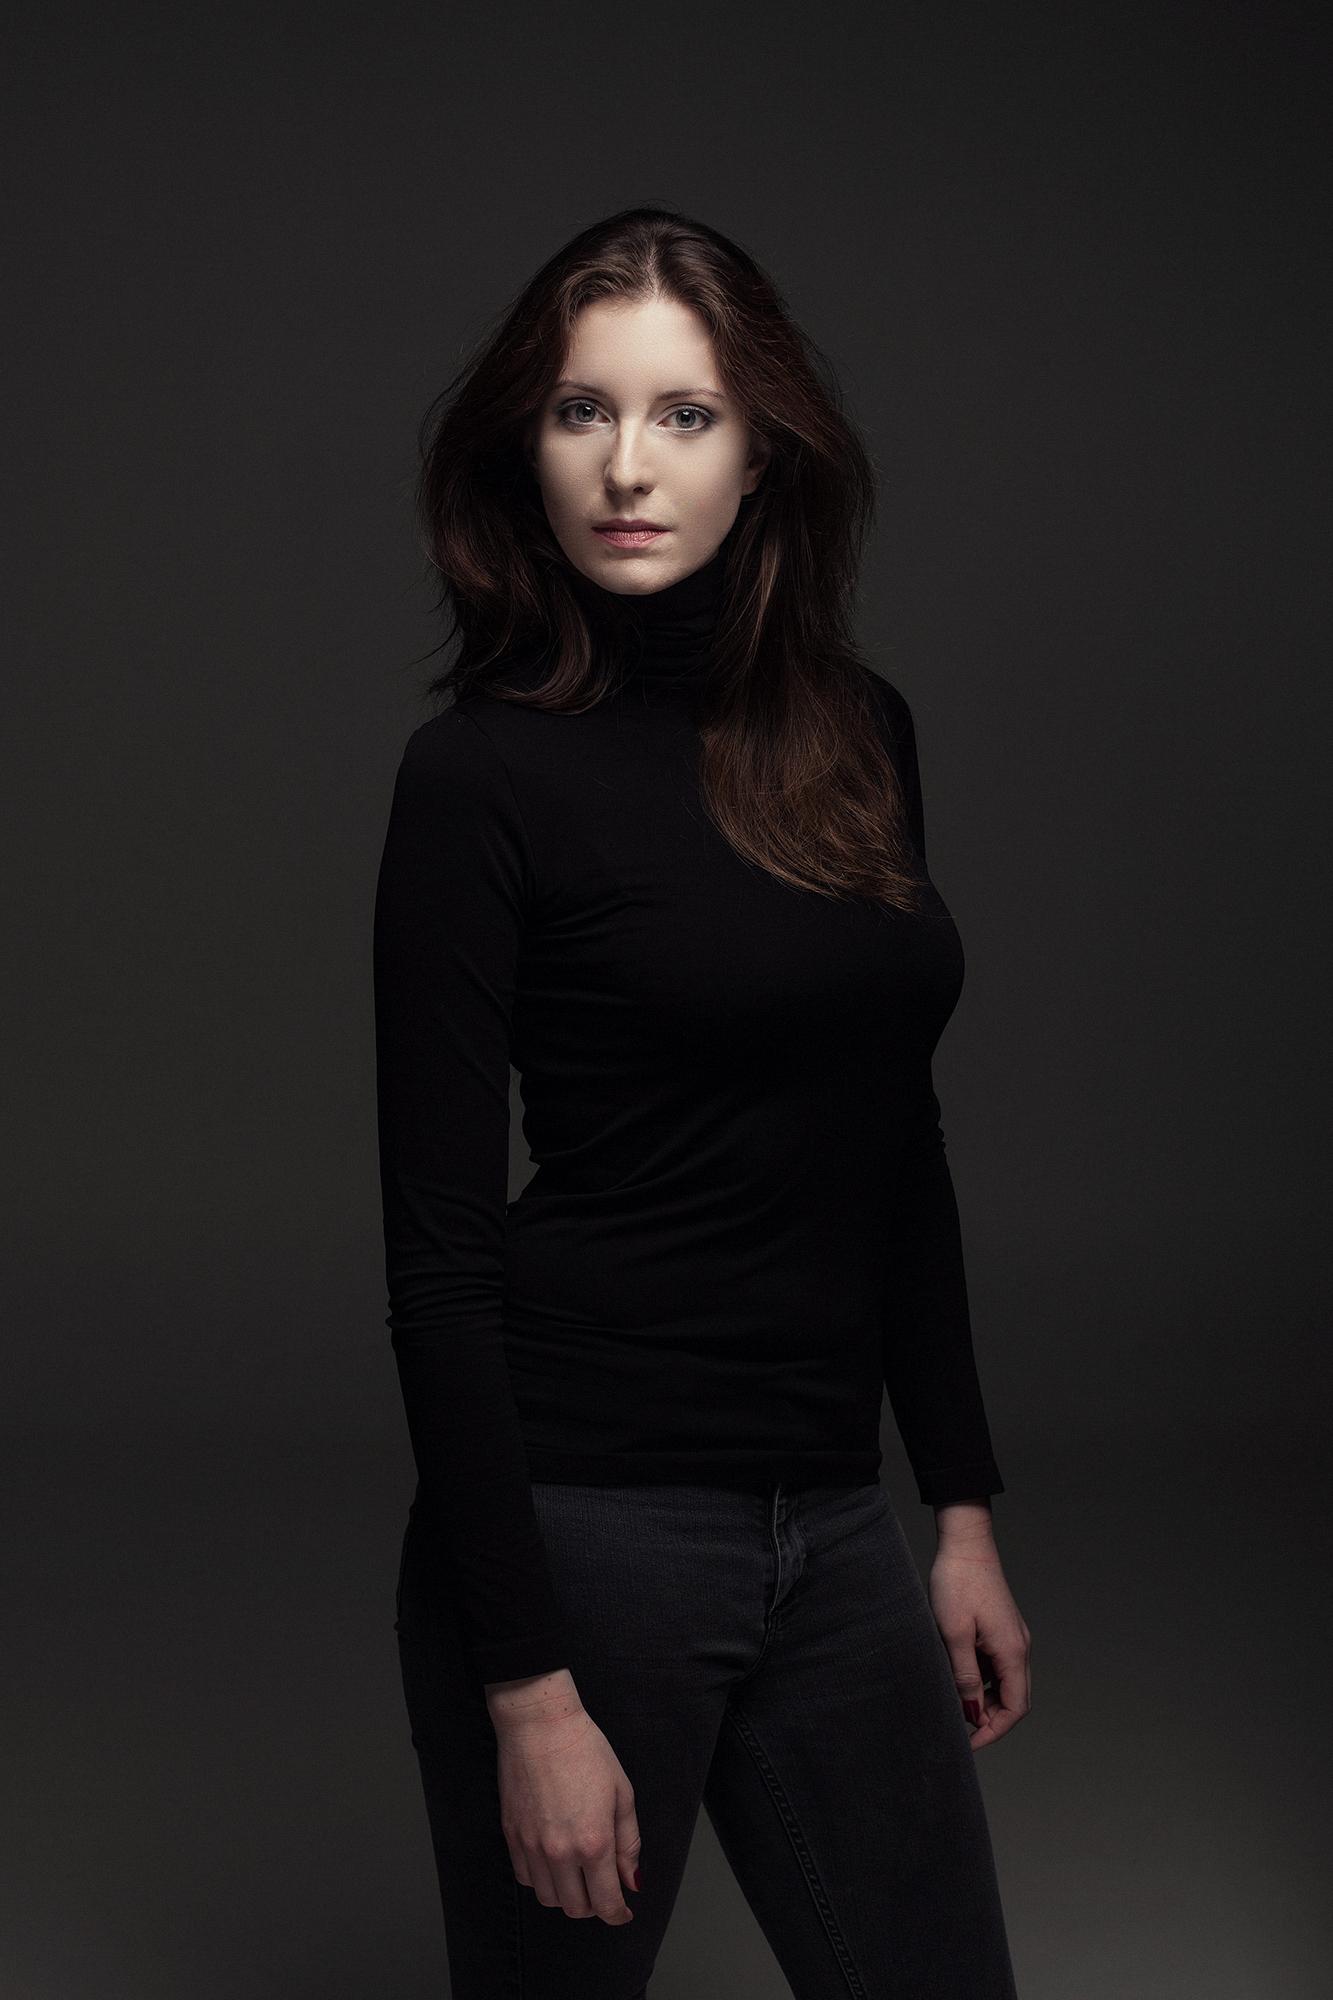 Katarzyna Głogowska IQ ART Agencja Aktorska (2)